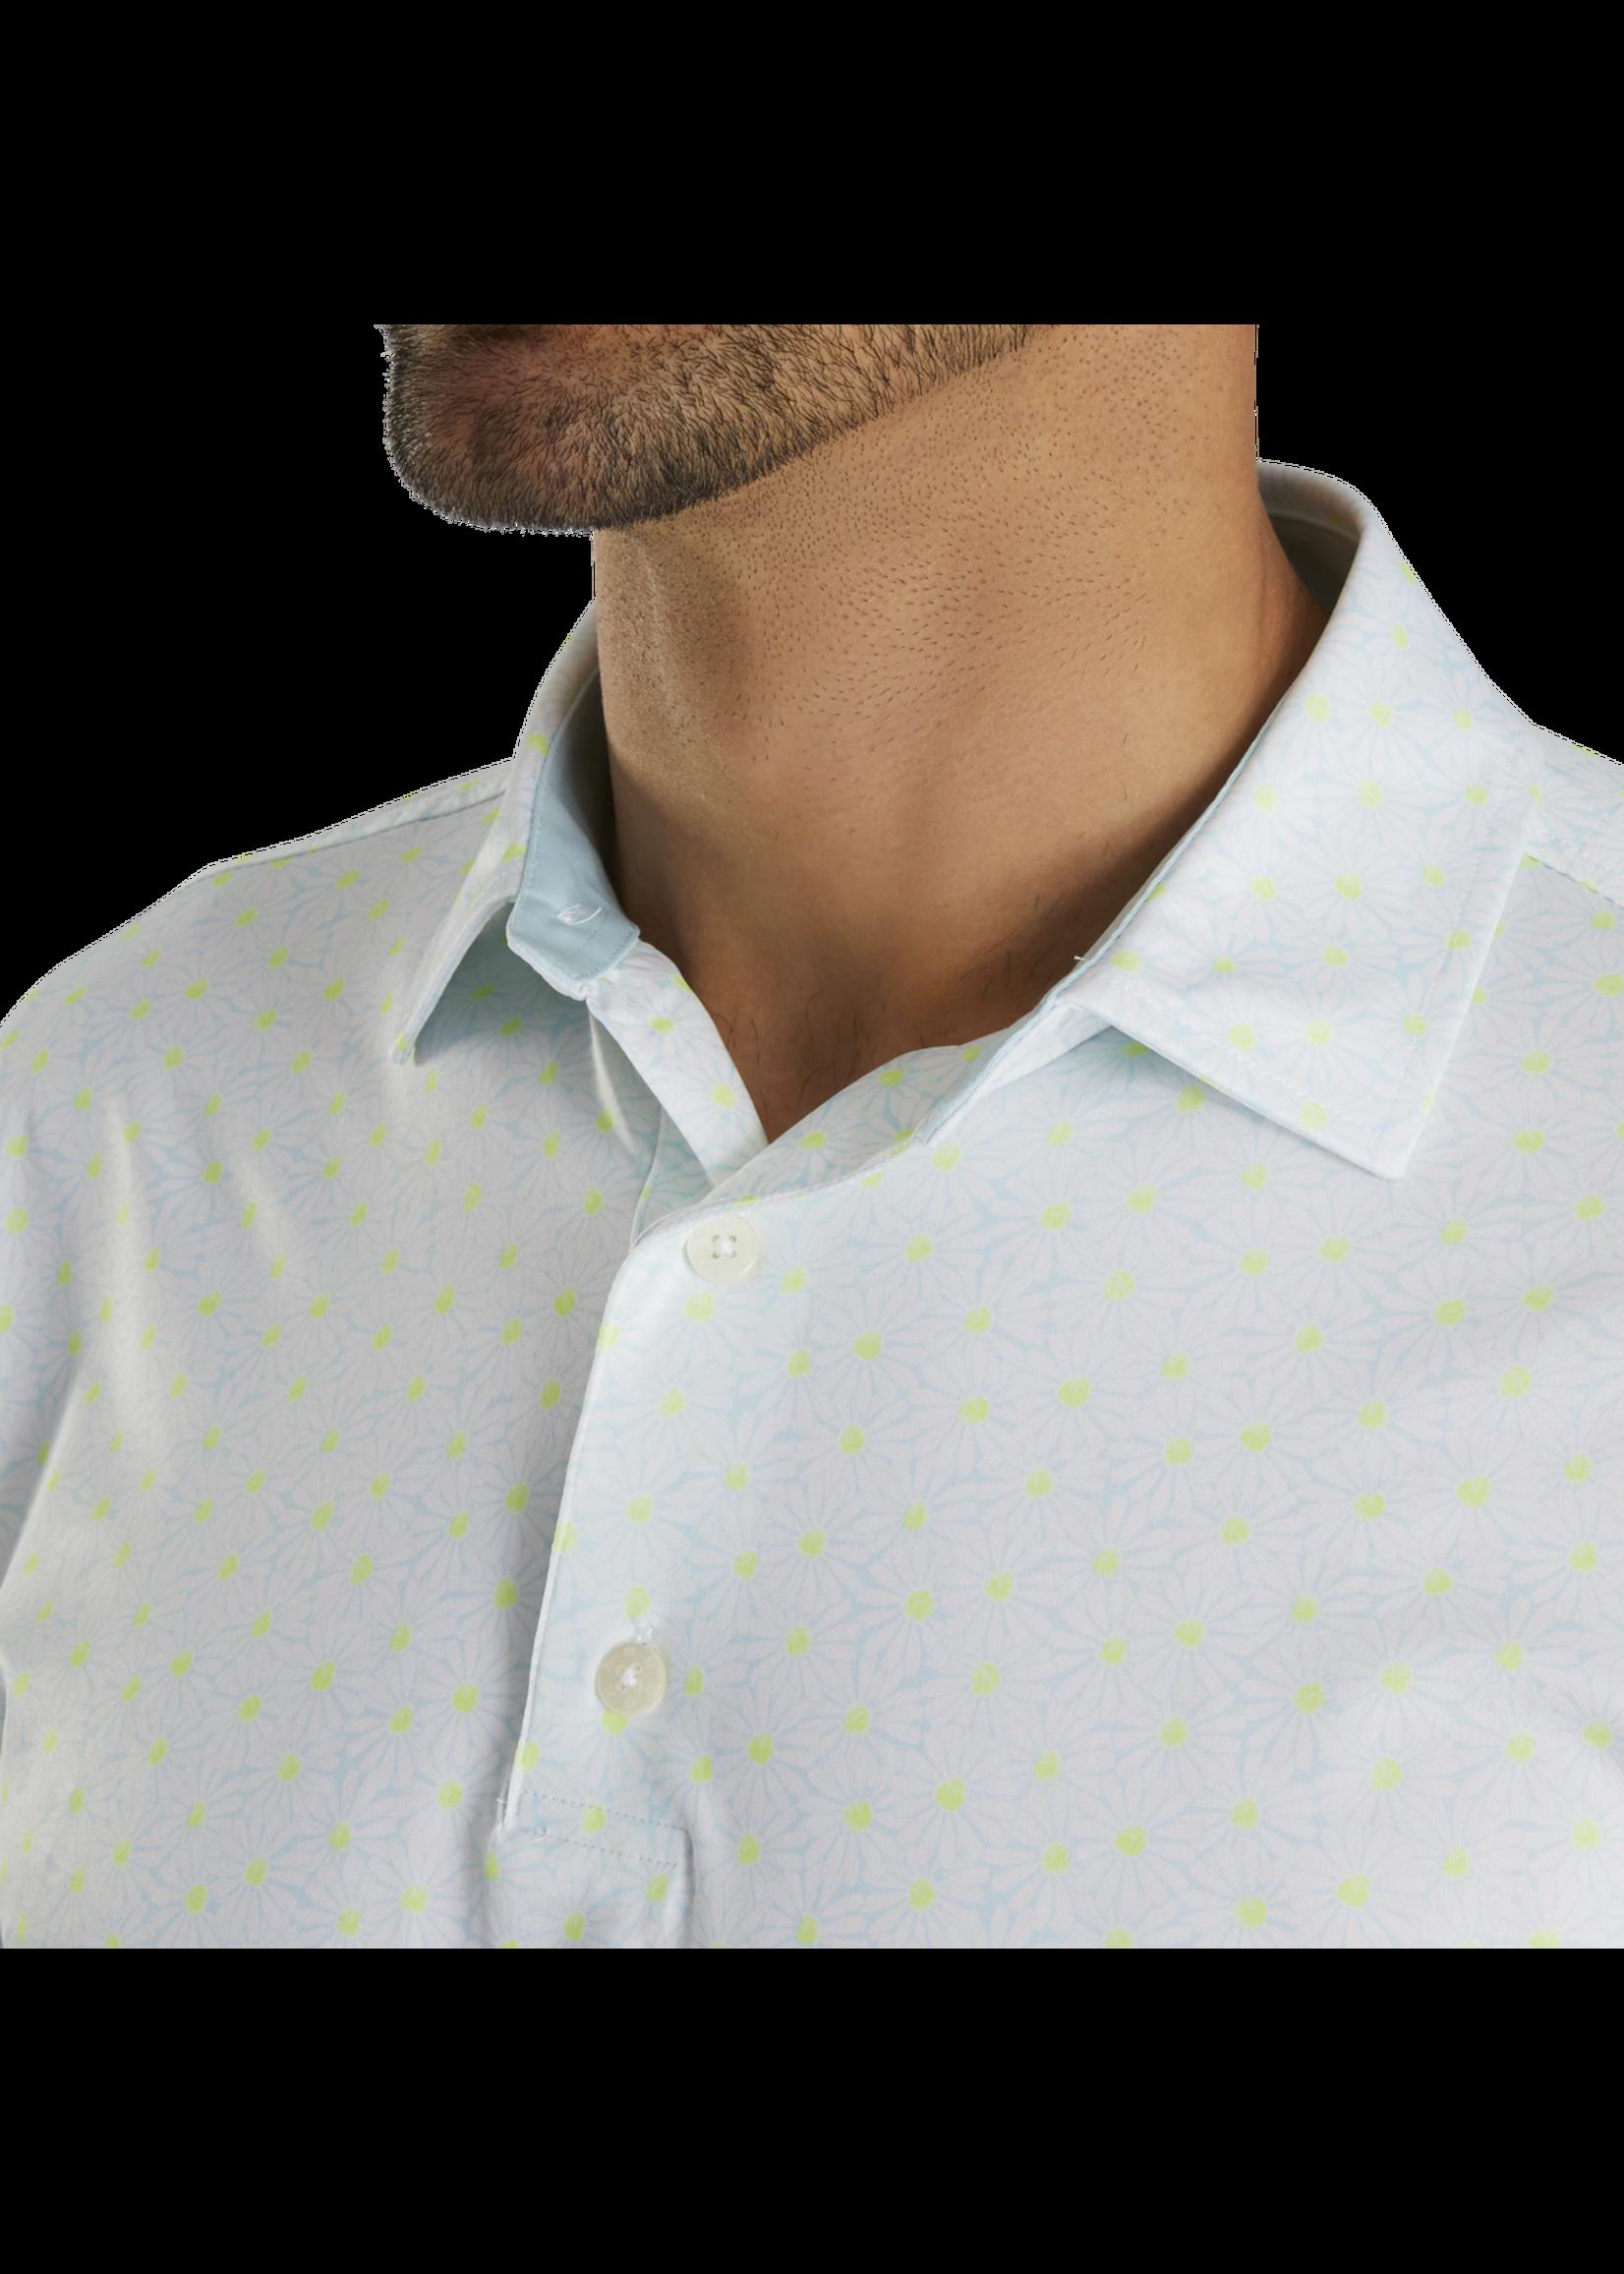 FJ Golf Shirt Daisy